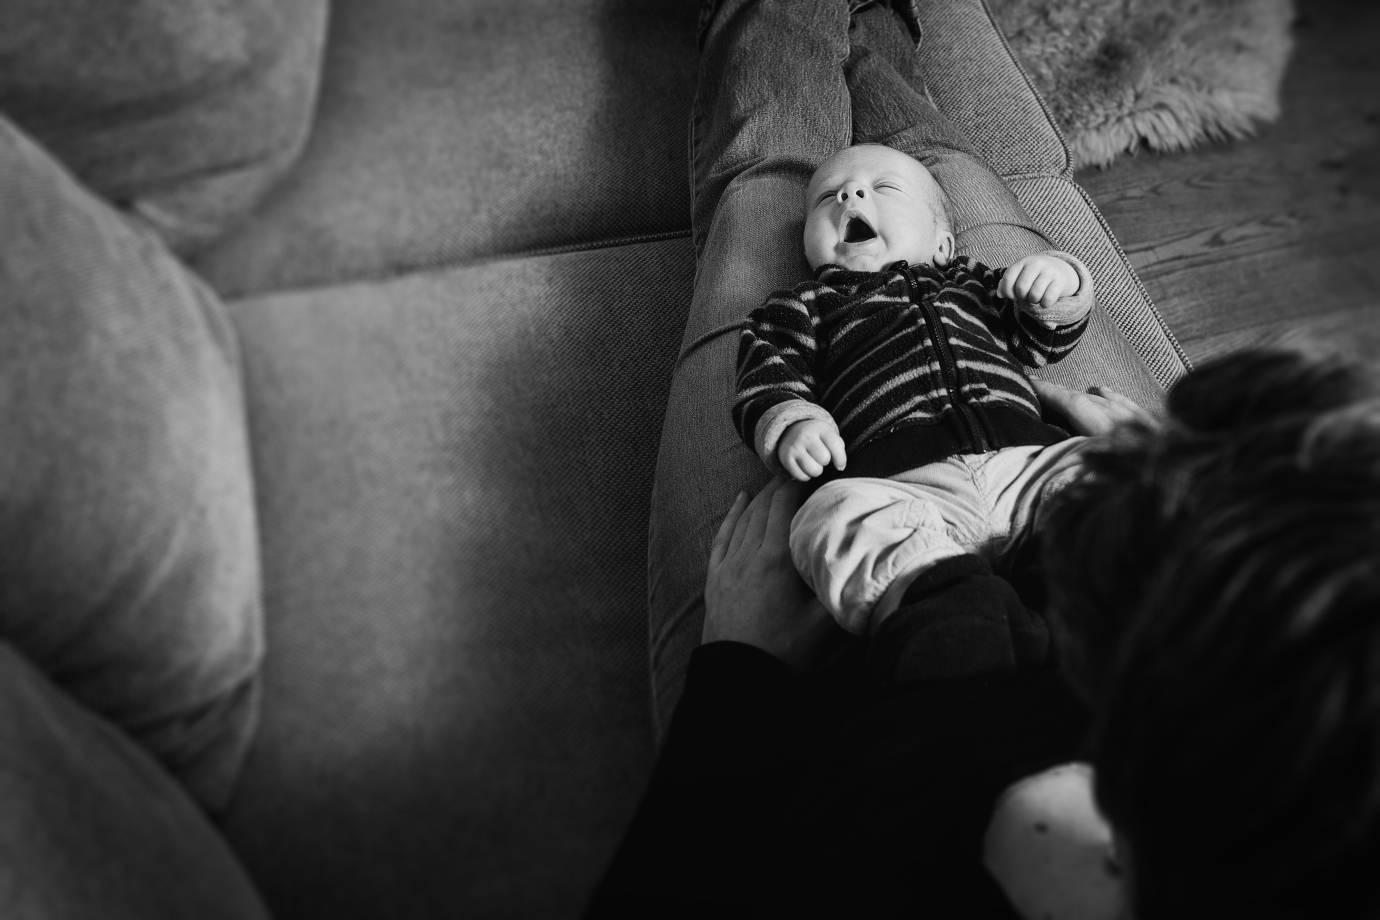 babyfotograf lilienthal 4 - Max